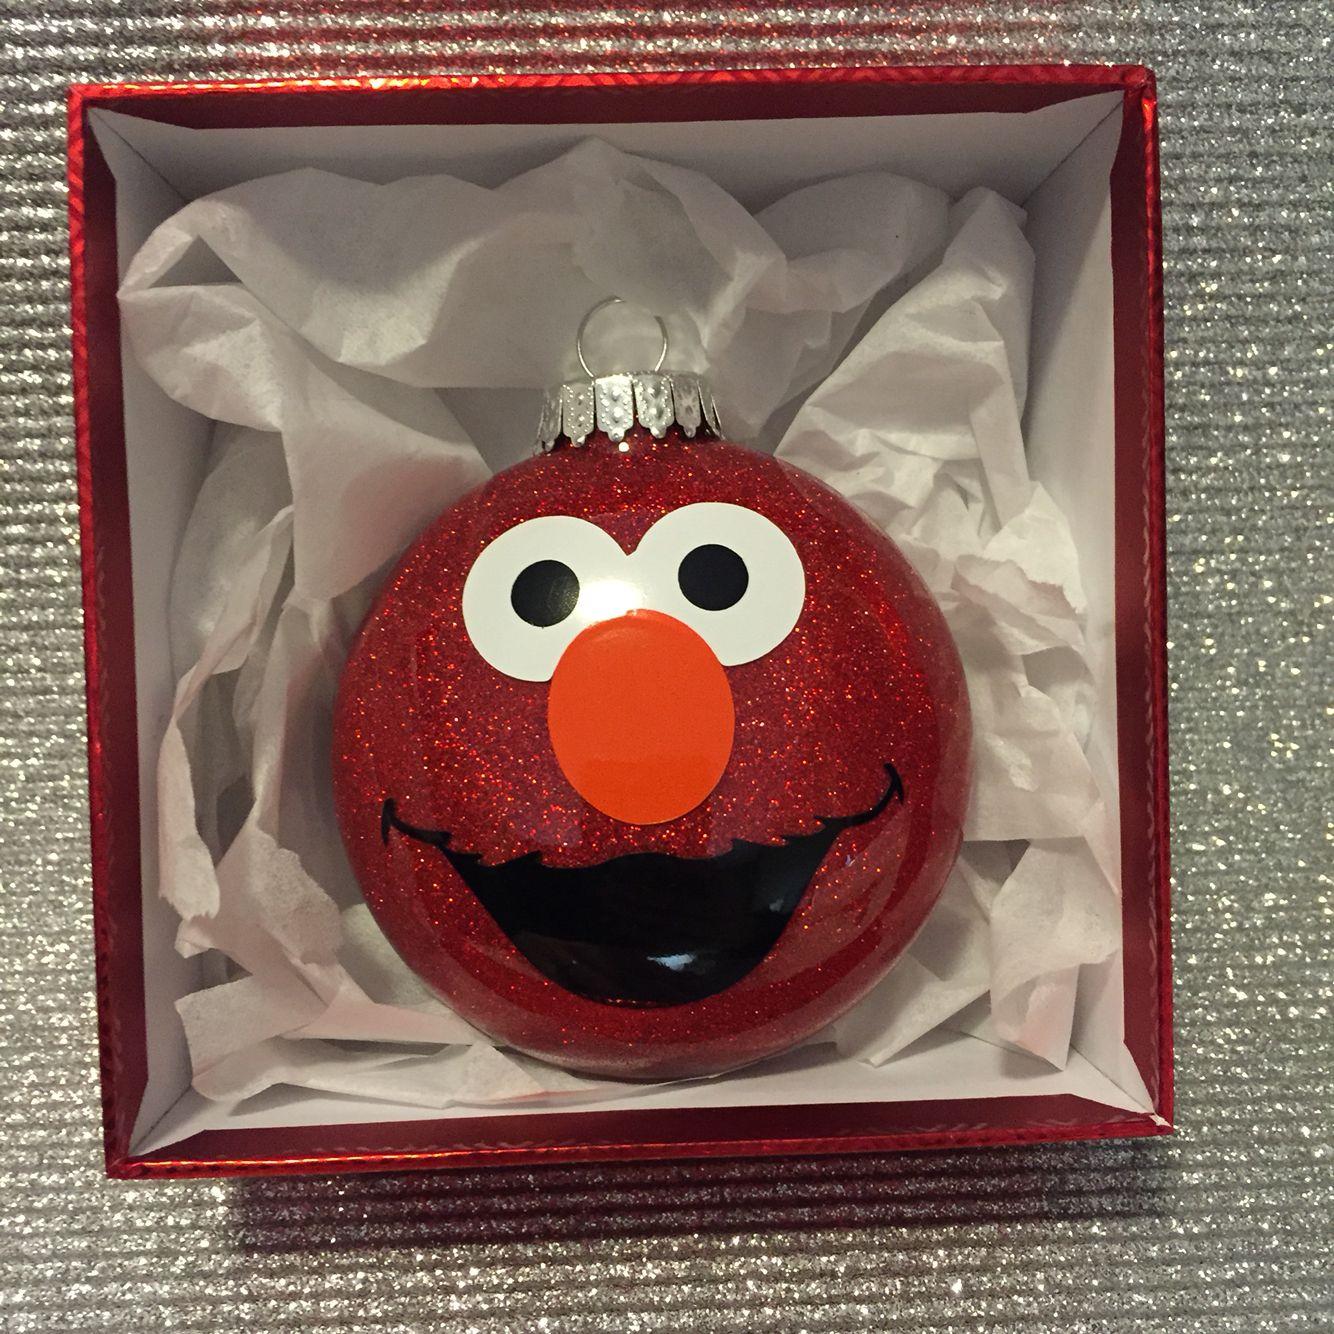 Elmo Ornament His Face Was Cutout Of Vinyl Using A Cricut